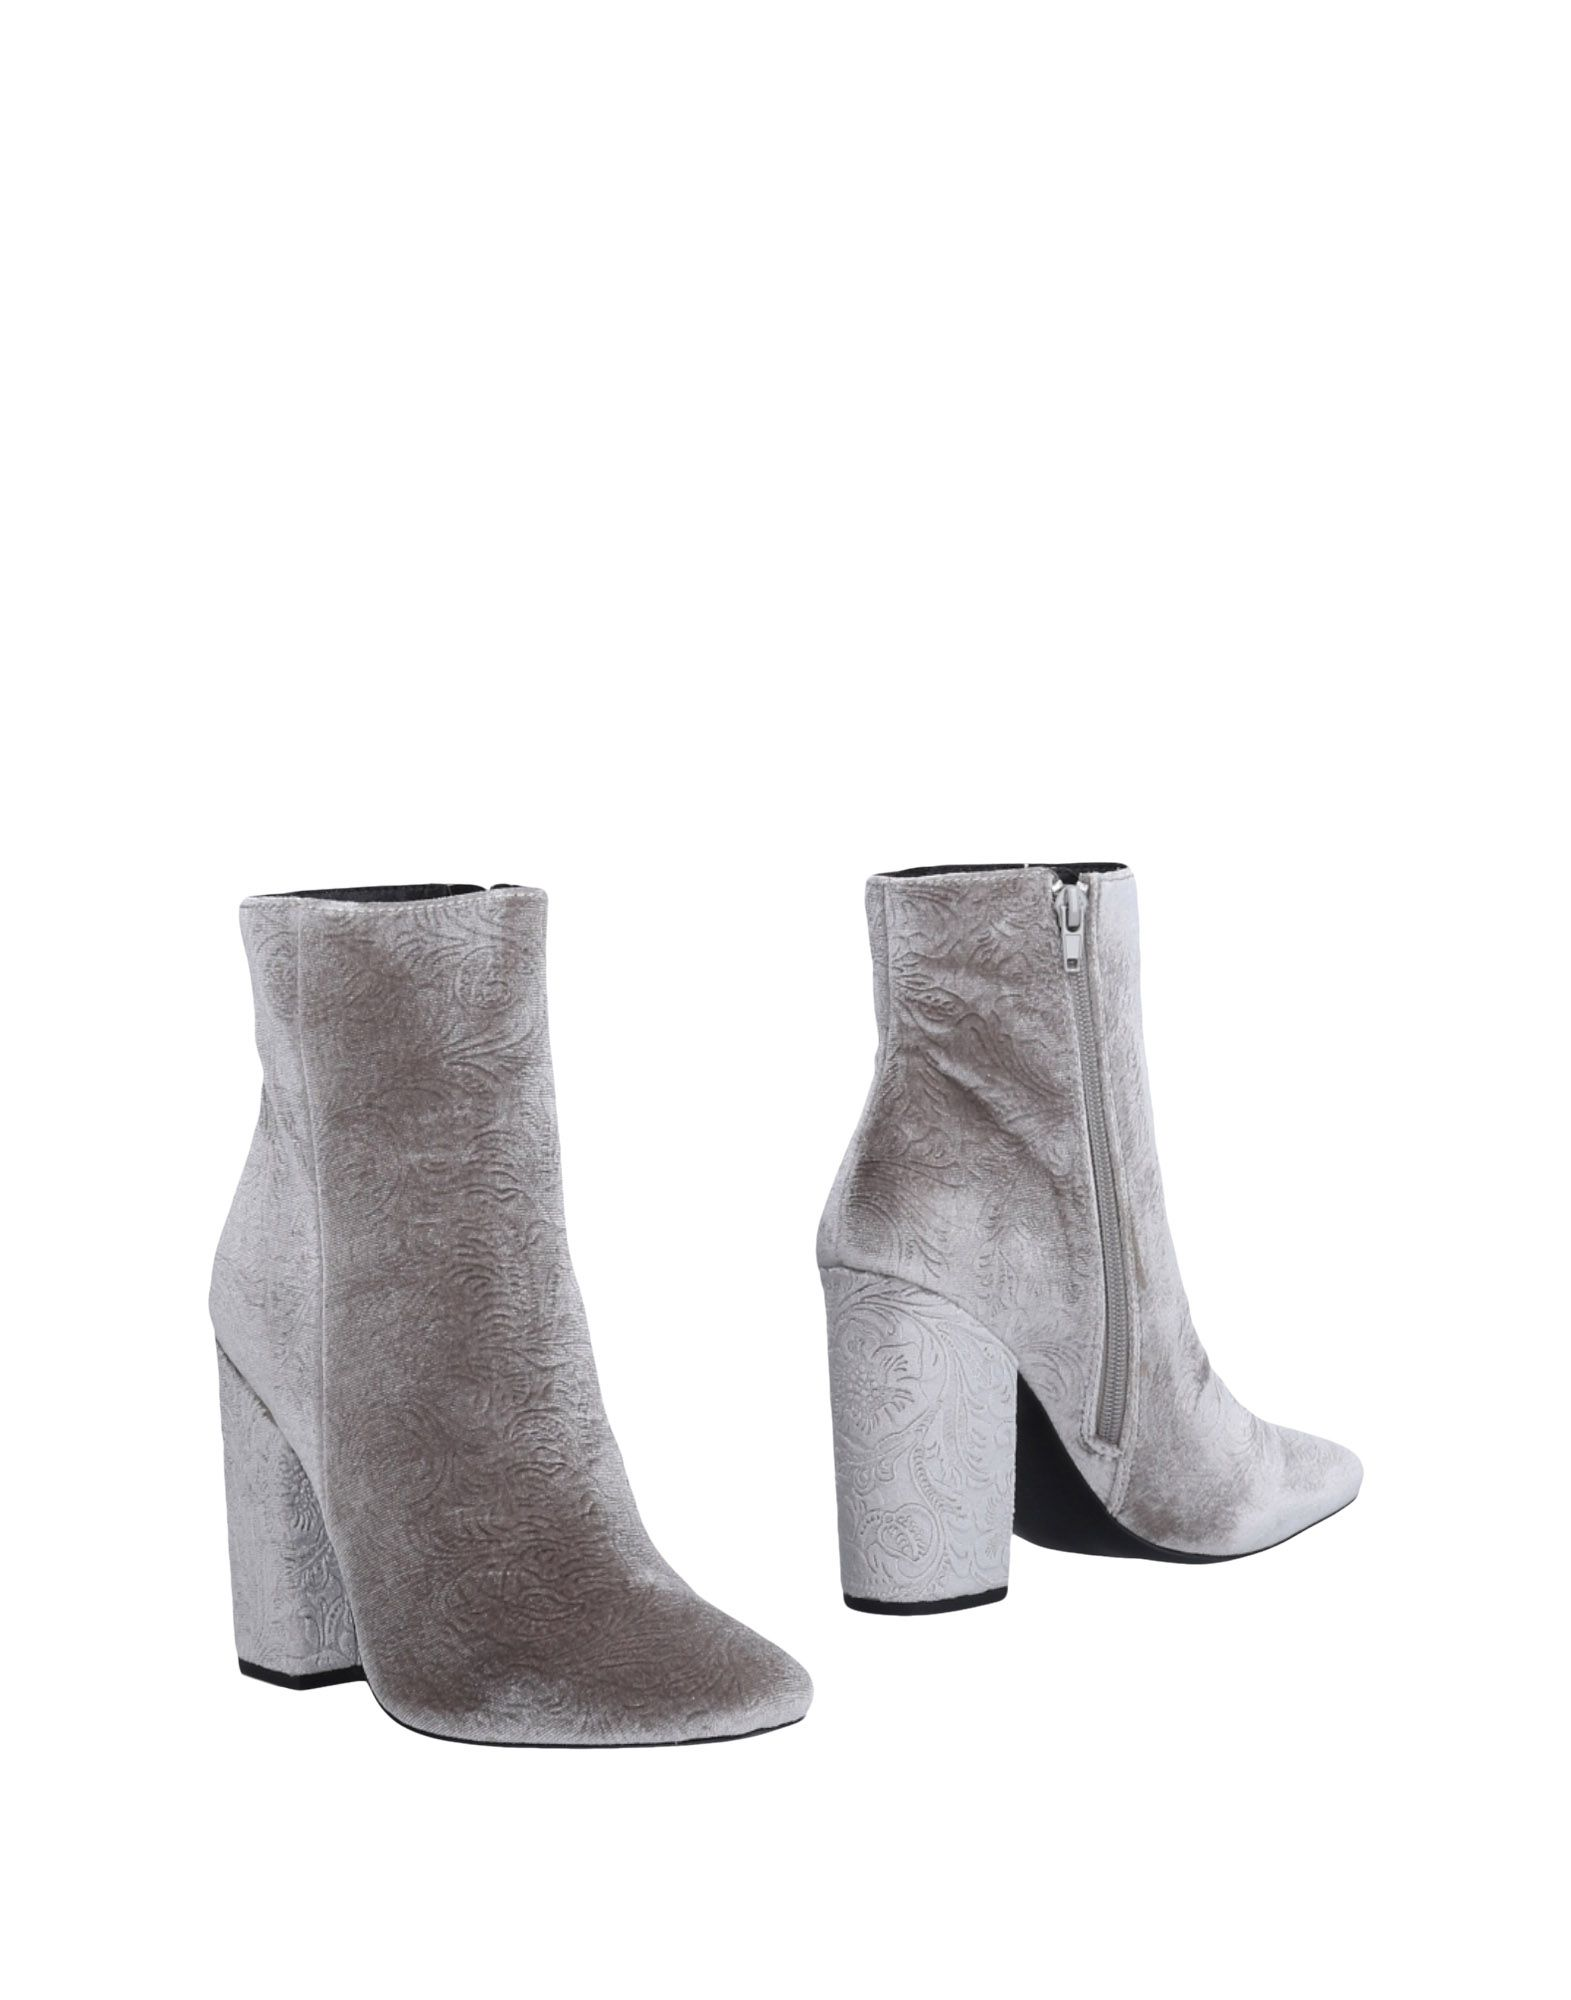 Windsor Smith Stiefelette Qualität Damen  11479412UG Gute Qualität Stiefelette beliebte Schuhe 7285ca